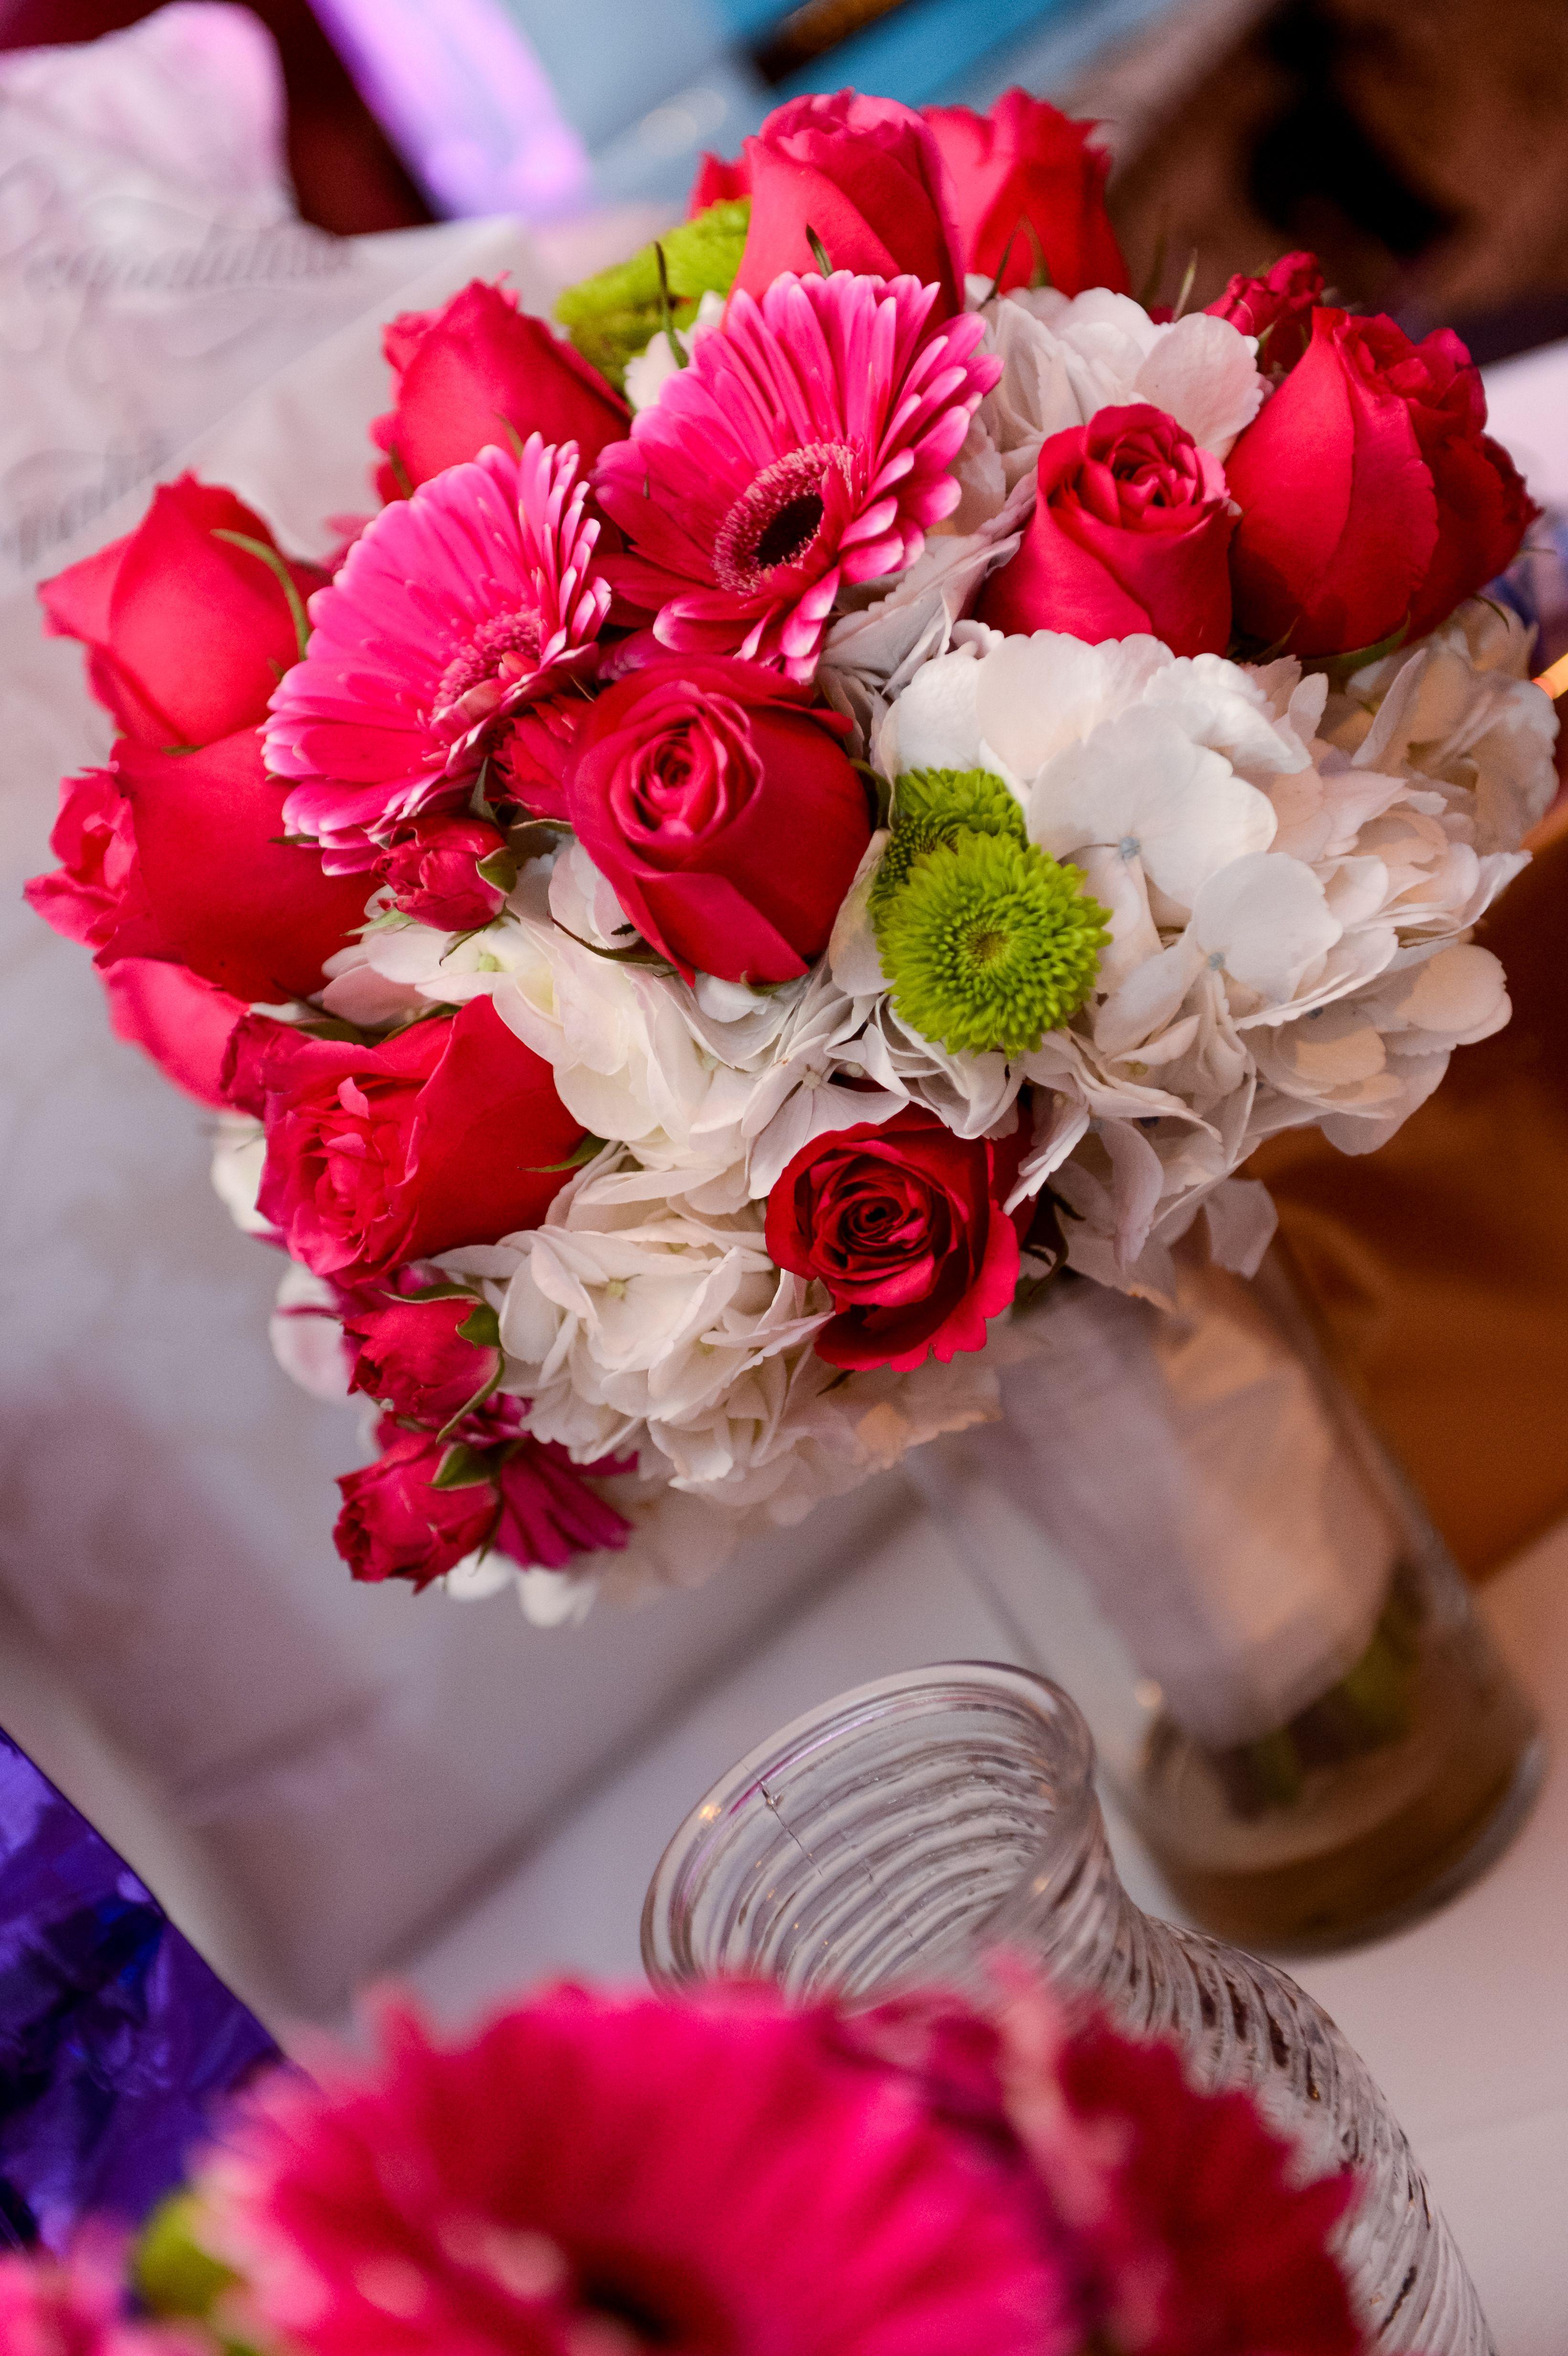 Hot pink roseshot pink gerbera daisies with white